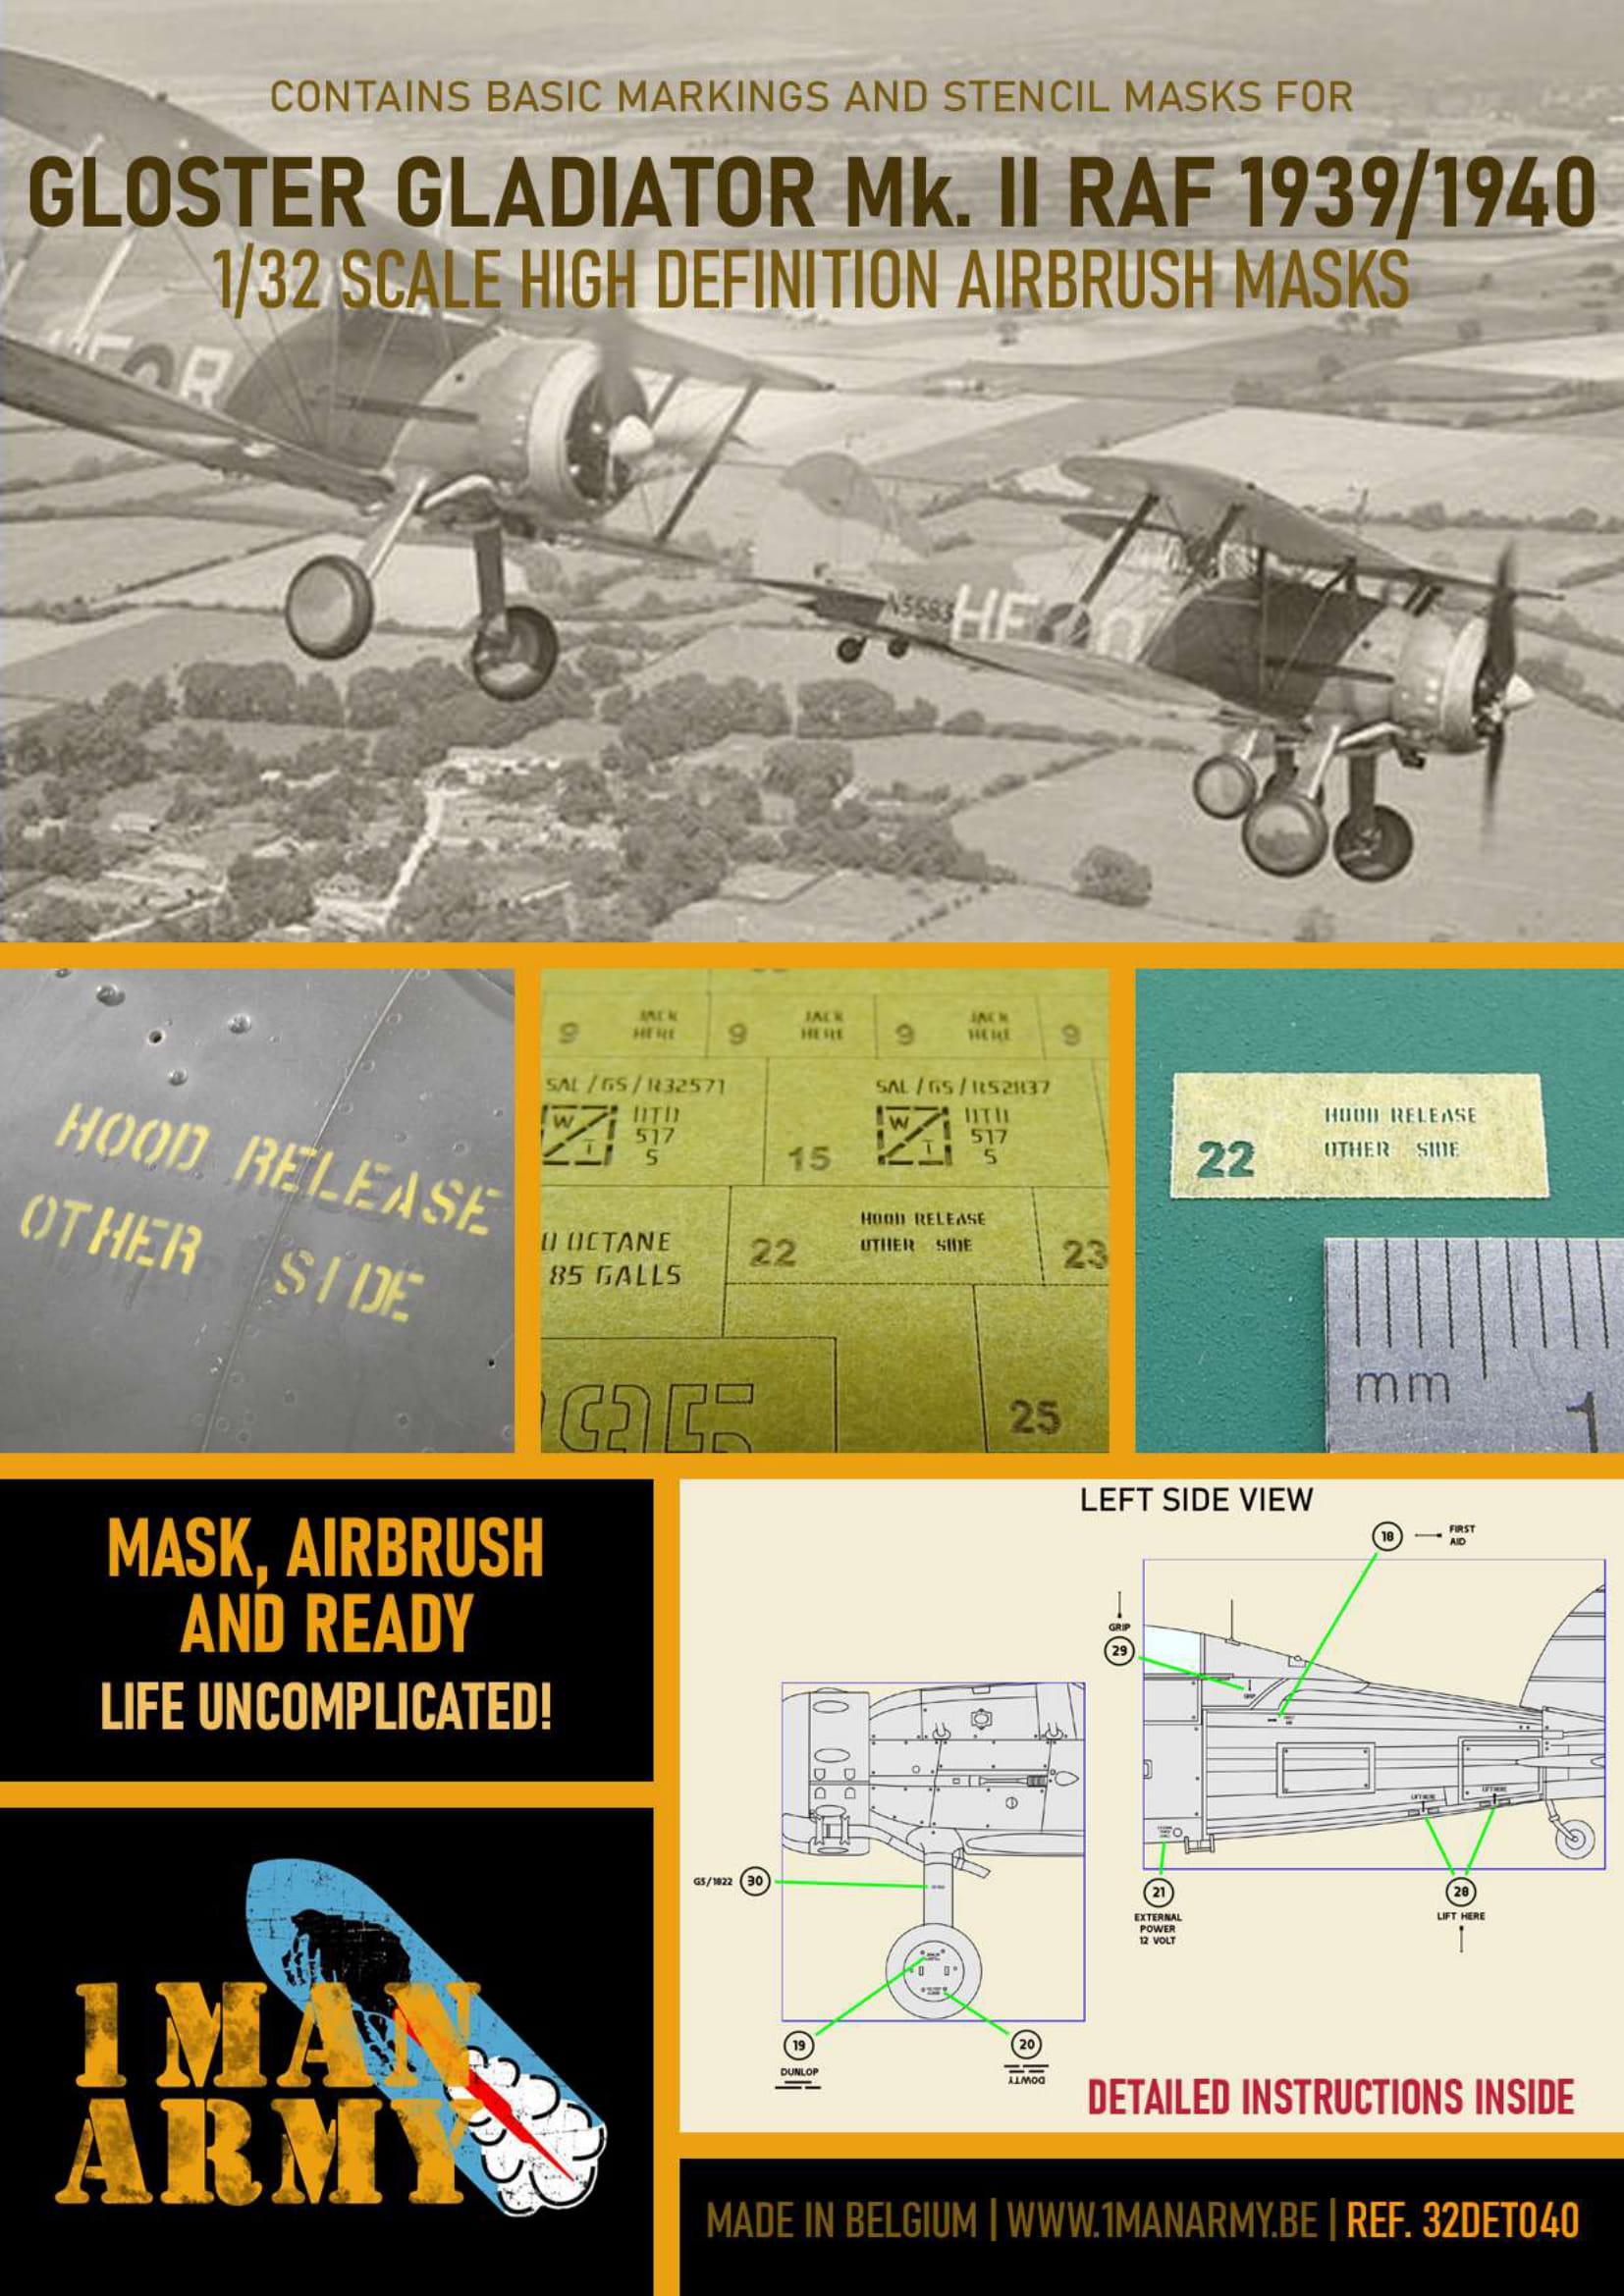 1ManArmy 1/32 Gloster Gladiator Mk.II RAF Airbrush Paint Mask